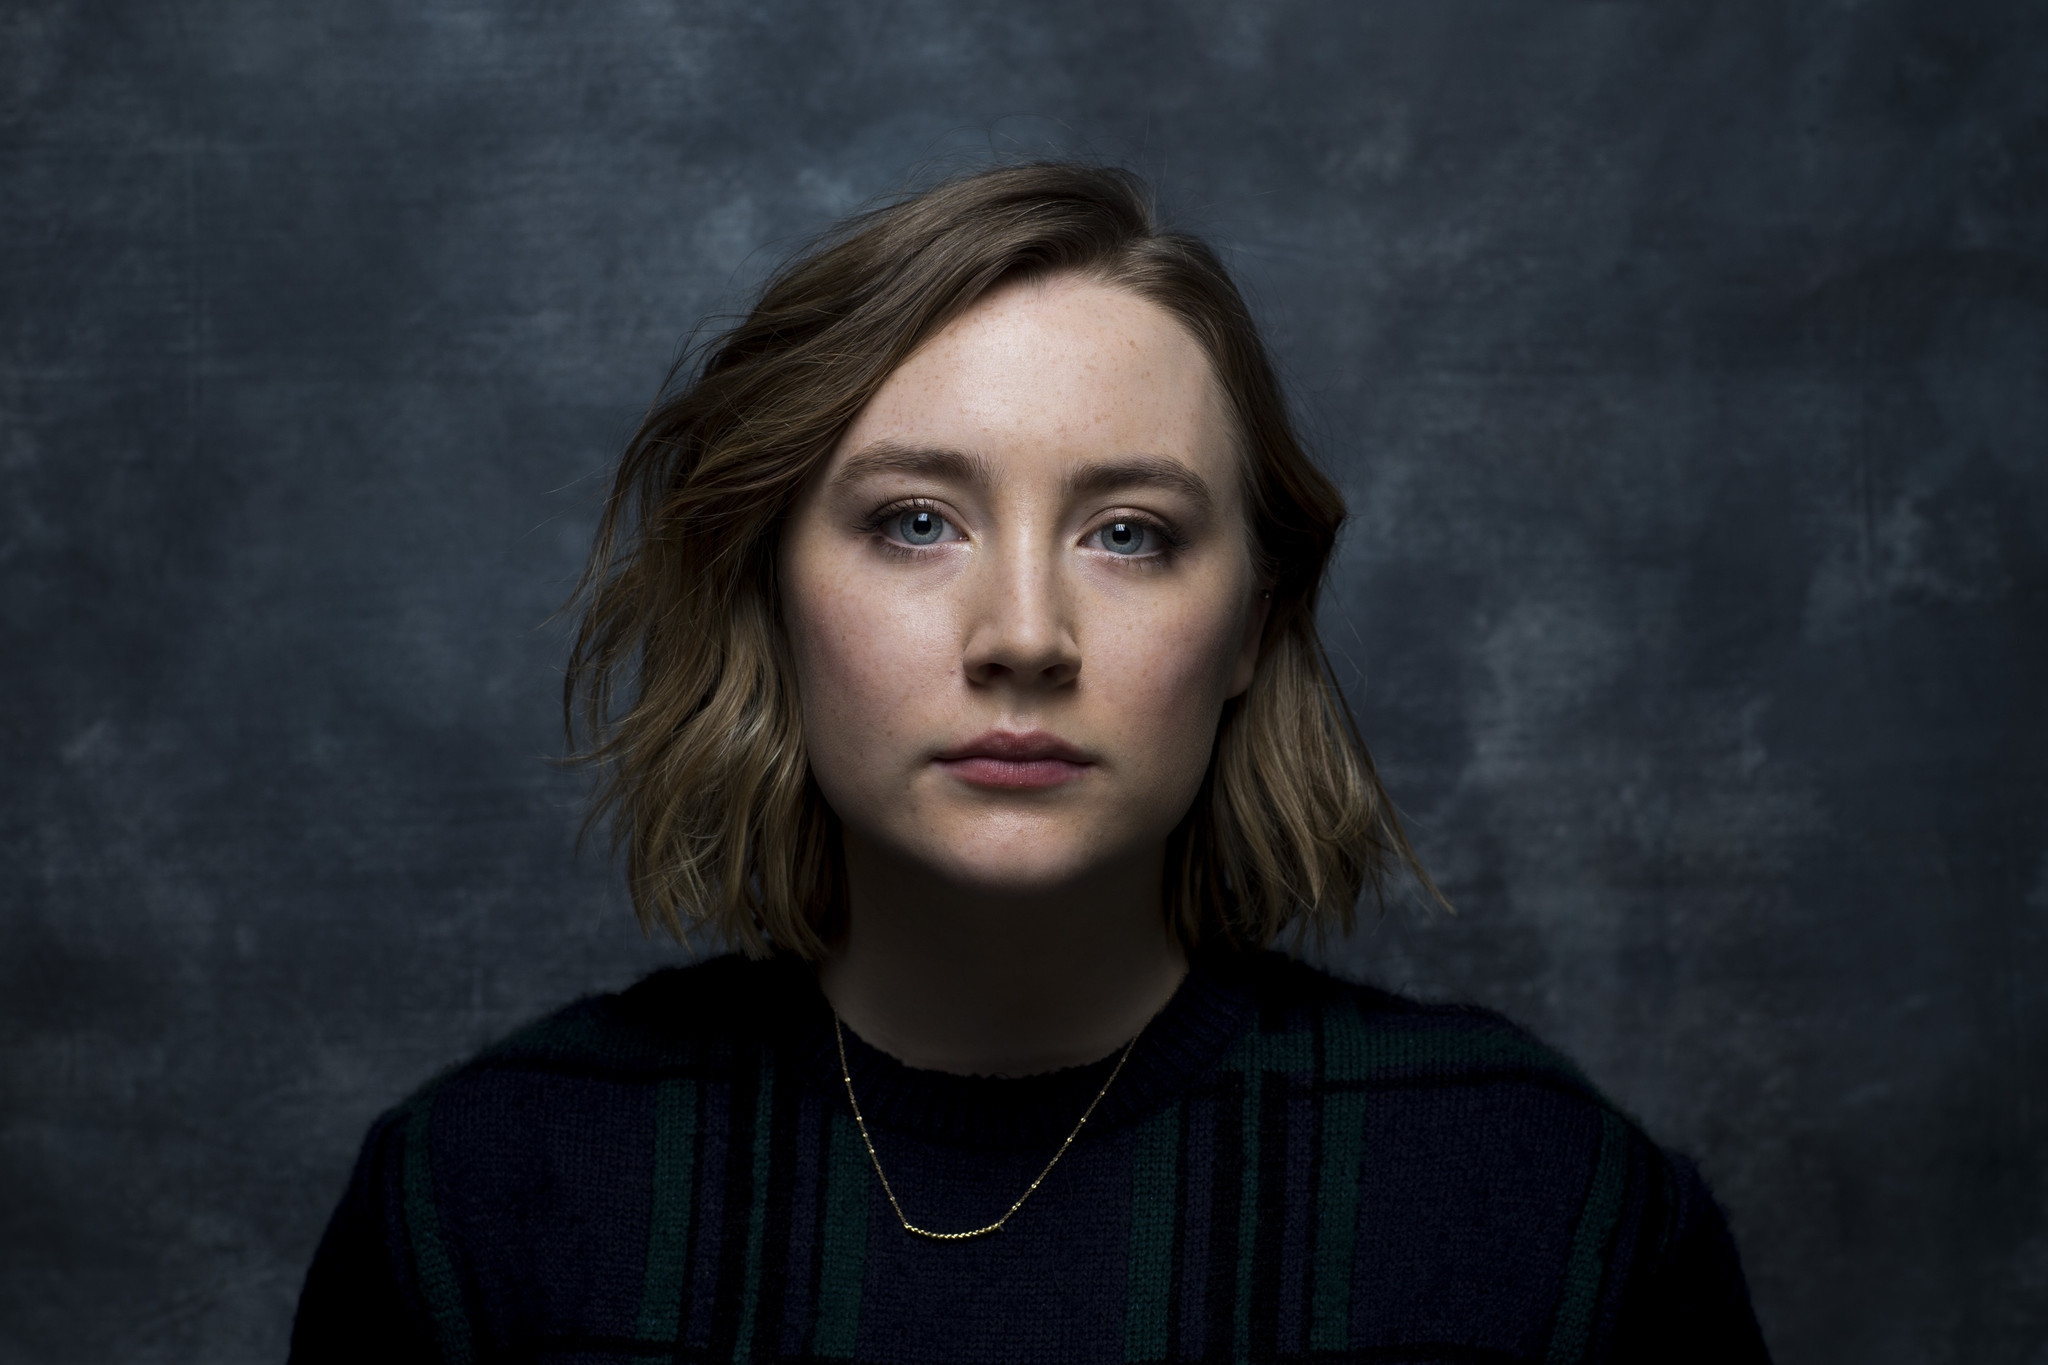 Saoirse Ronan High Definition Wallpapers